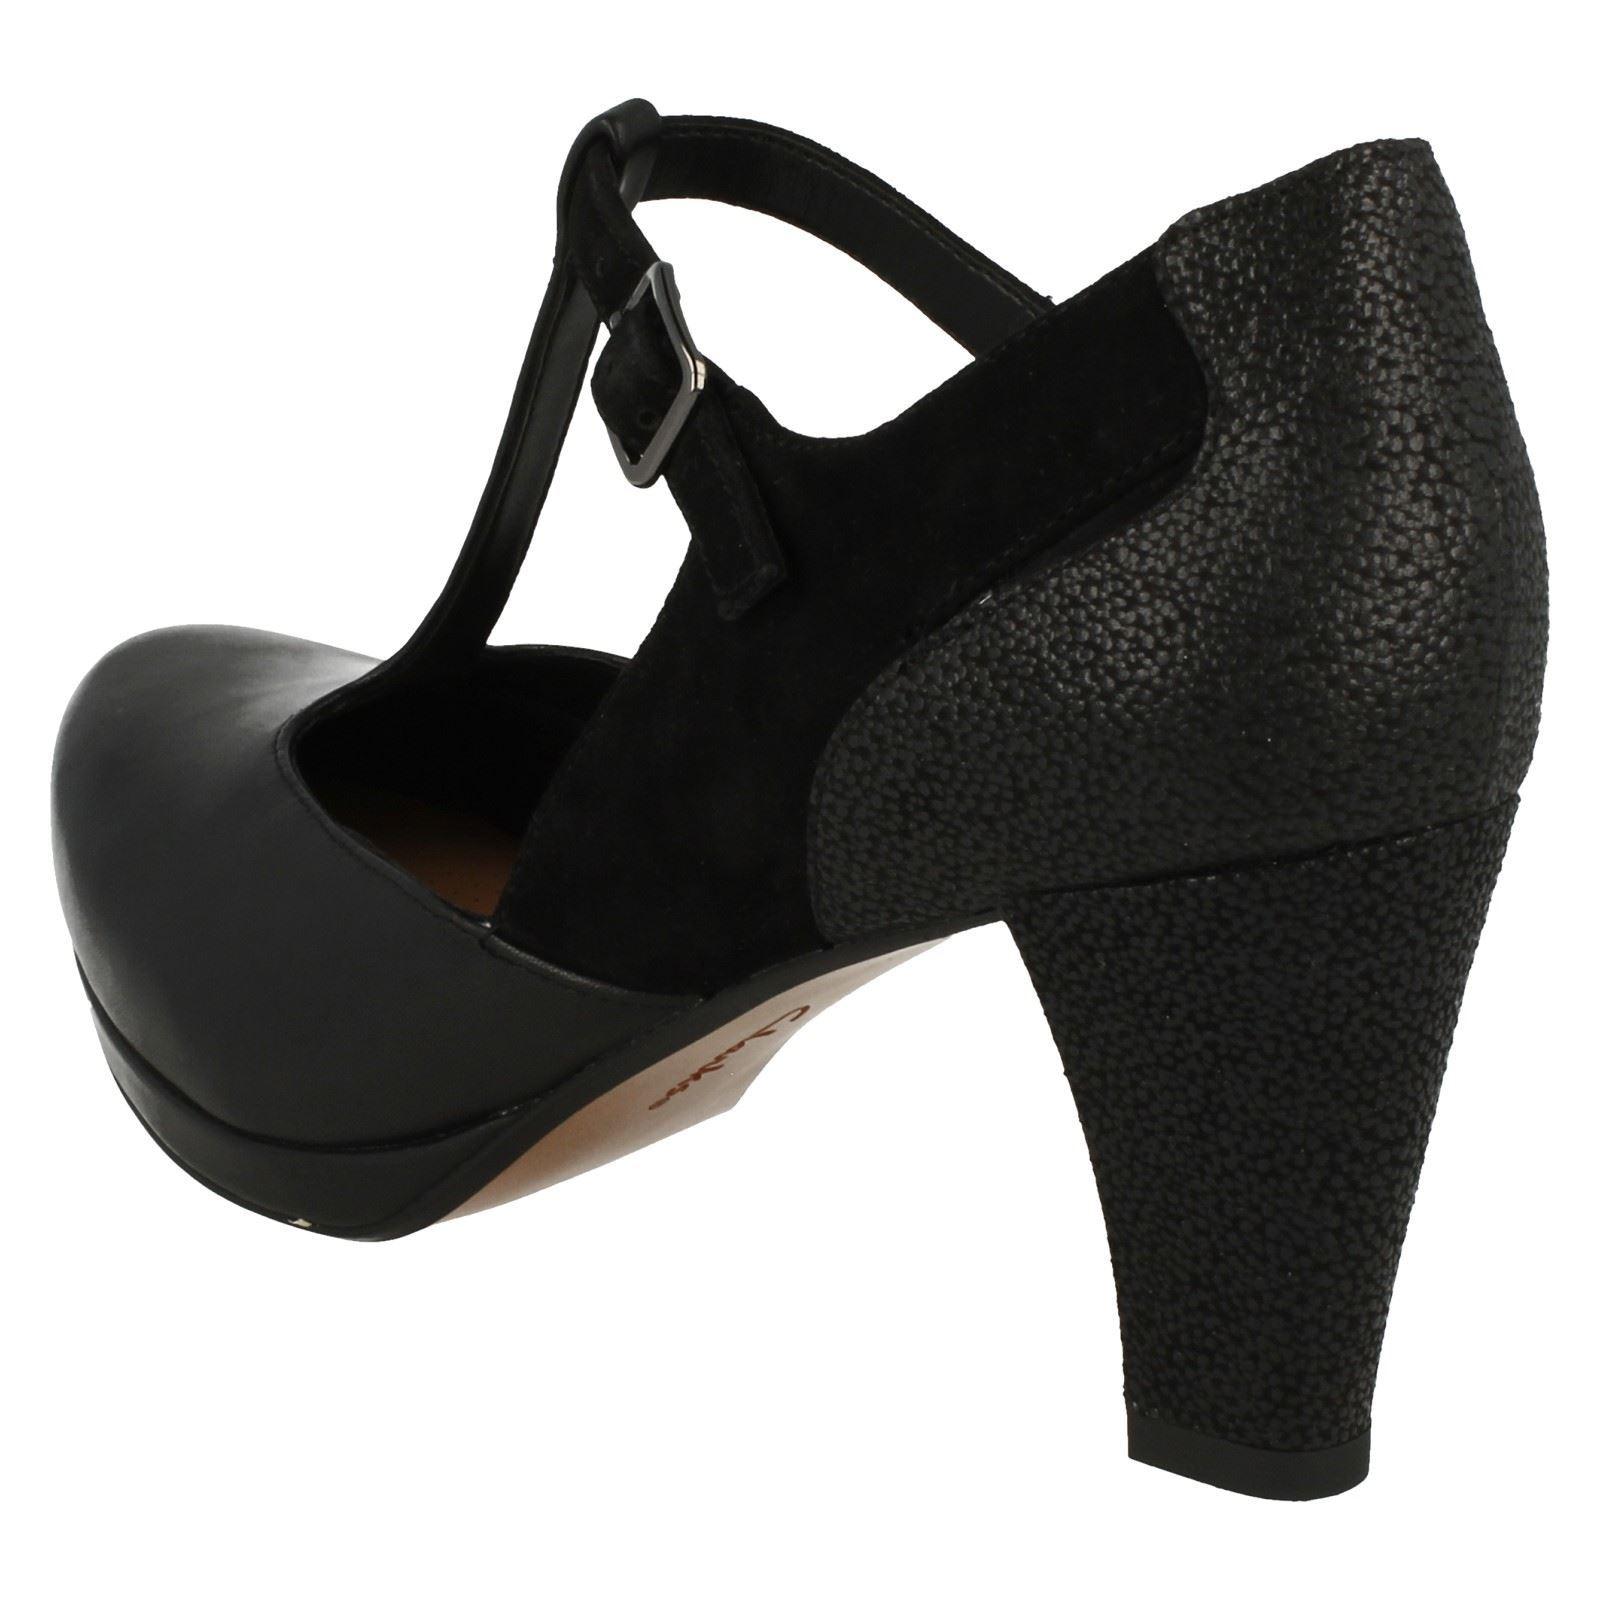 clarks high heel t bar shoes style chorus ebay